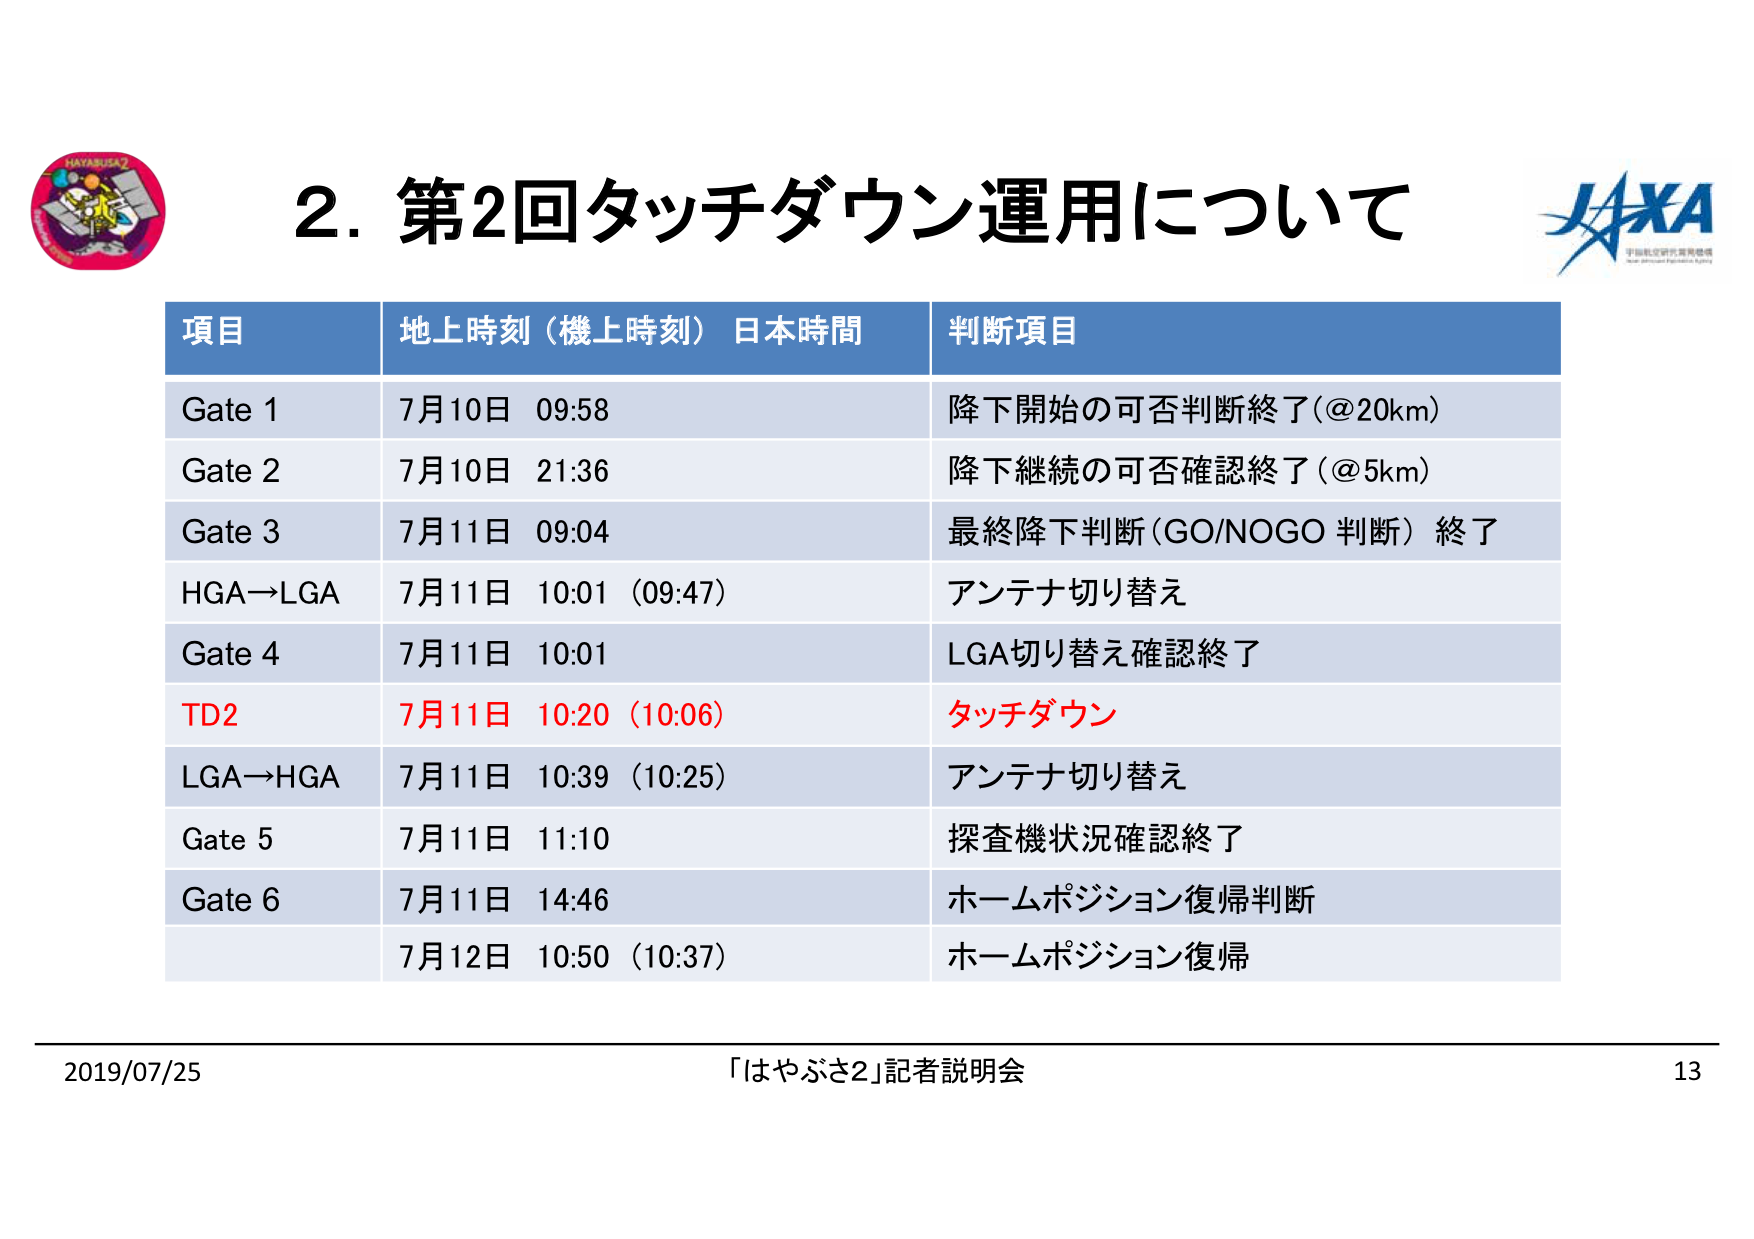 f:id:Imamura:20190725151154p:plain